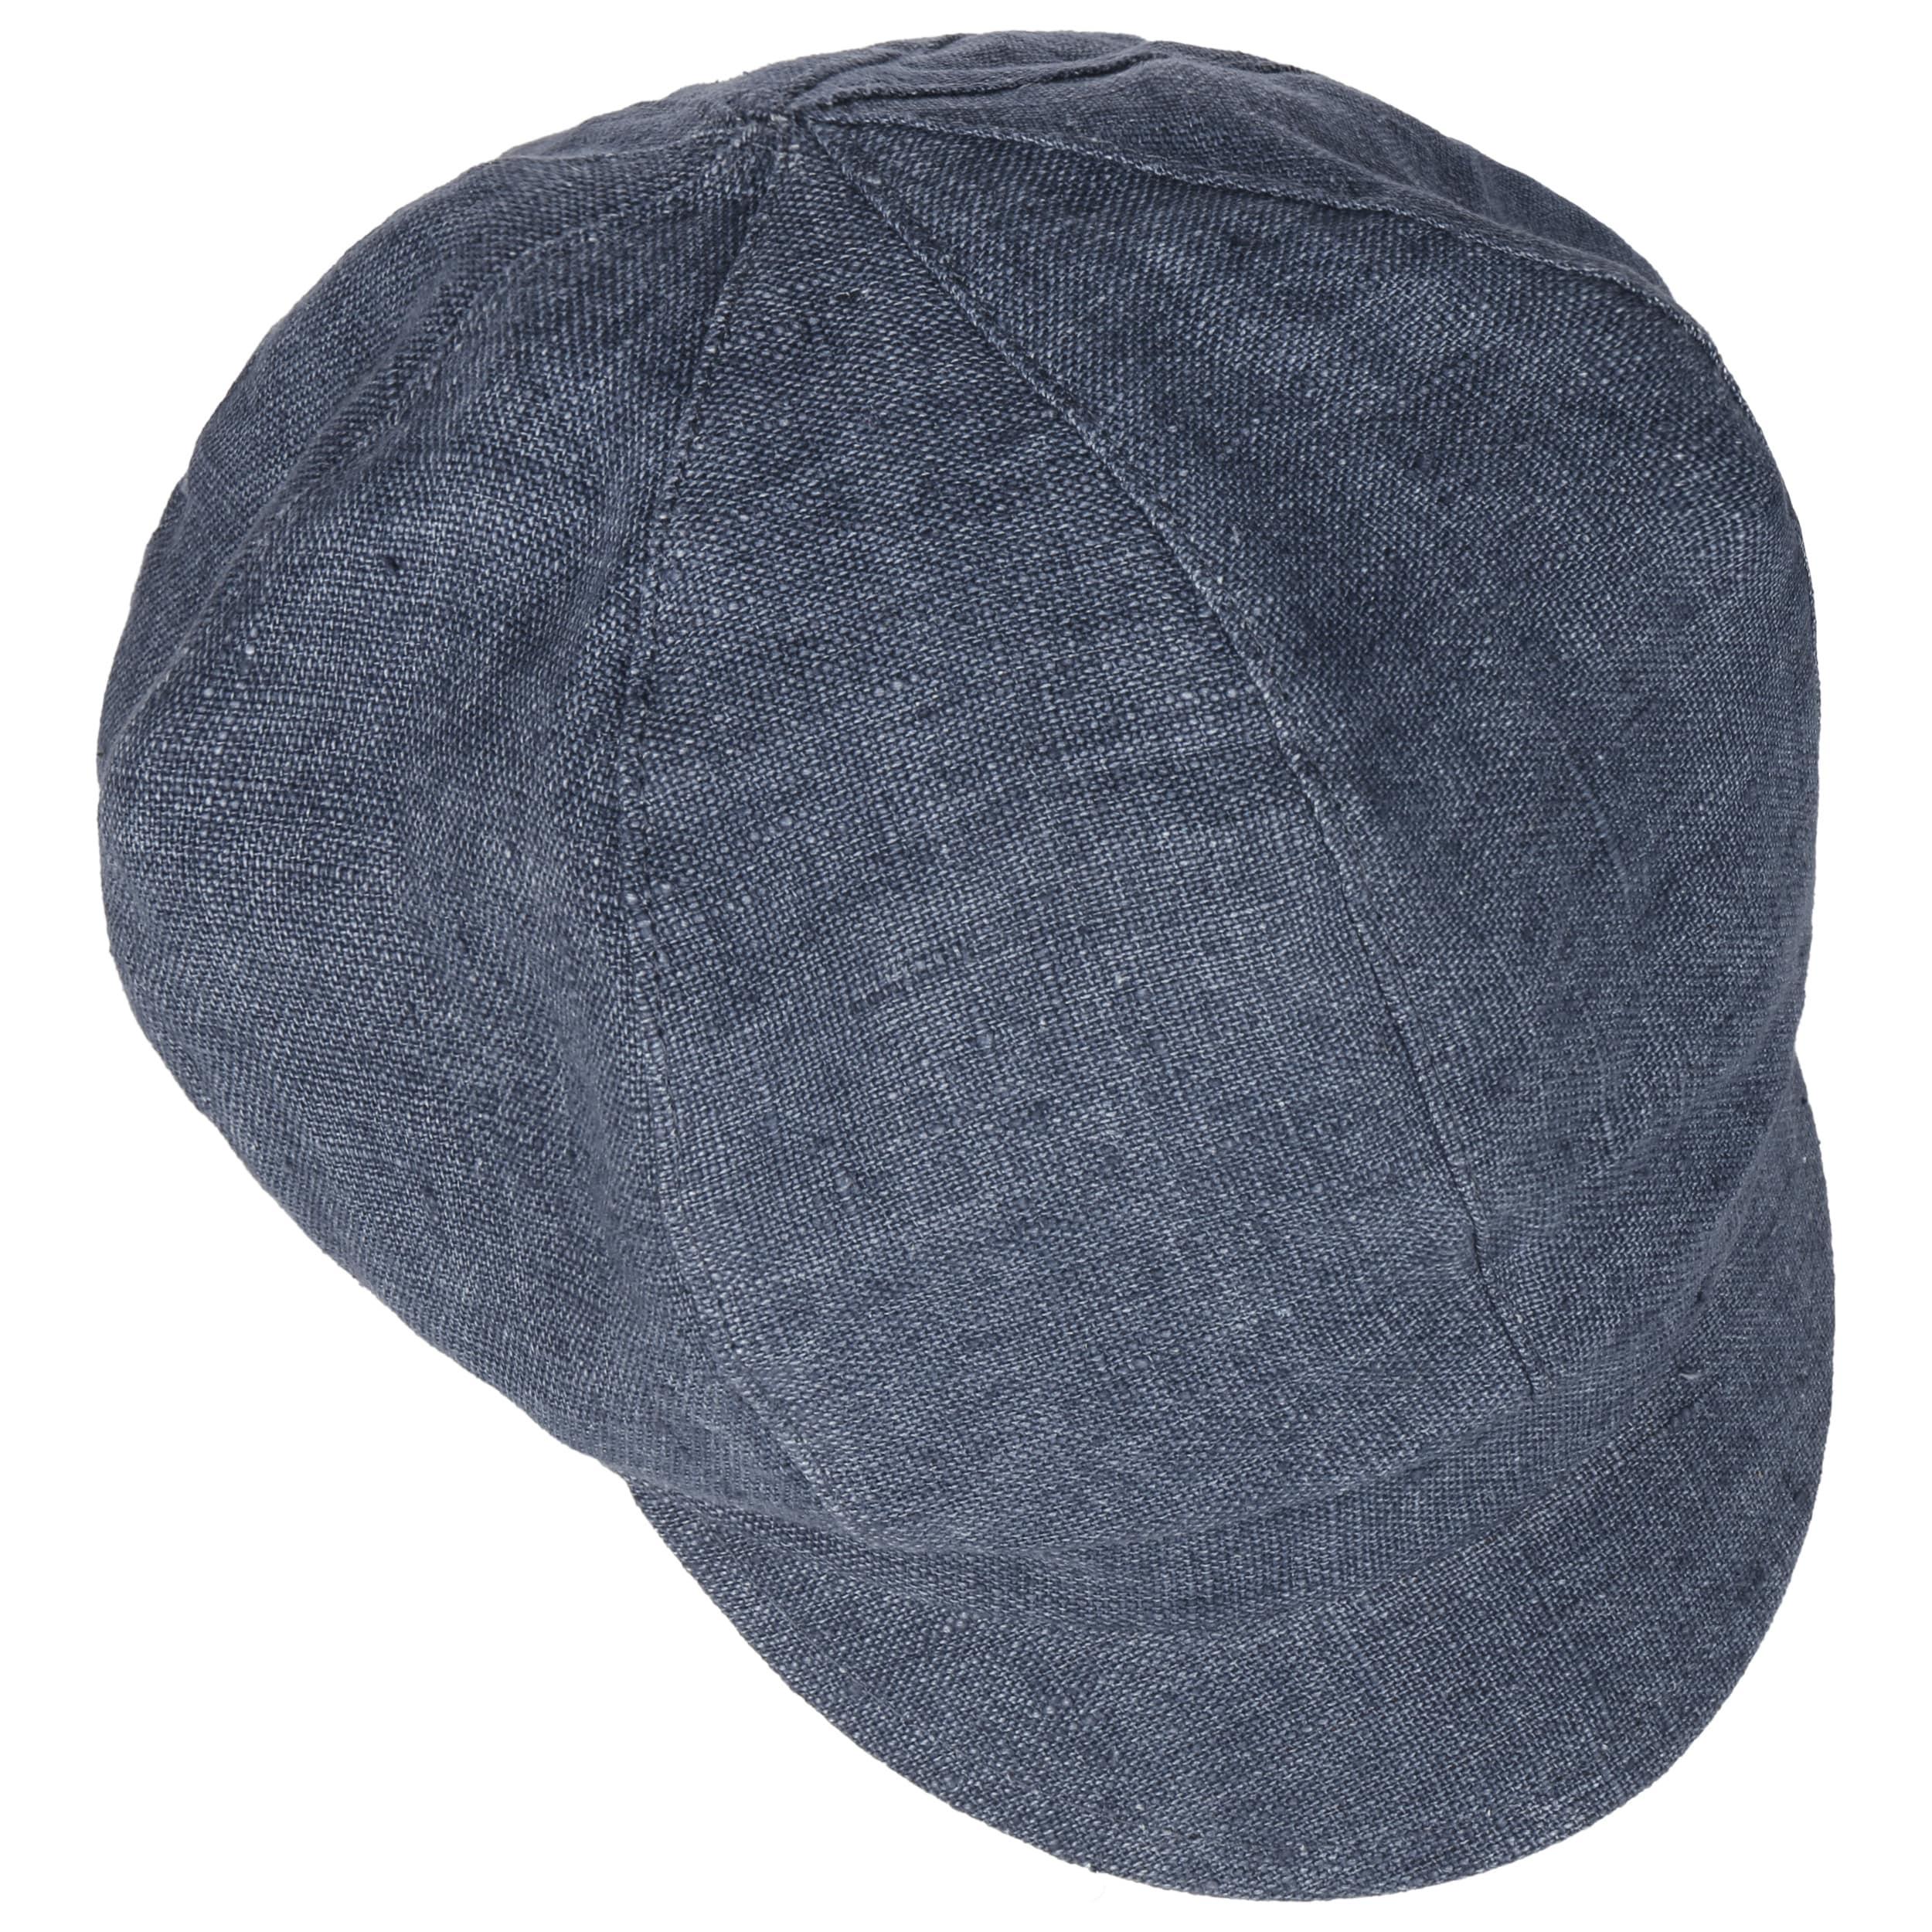 Gorra Newsboy Lino by bedacht - Gorras - sombreroshop.es 932dccee556